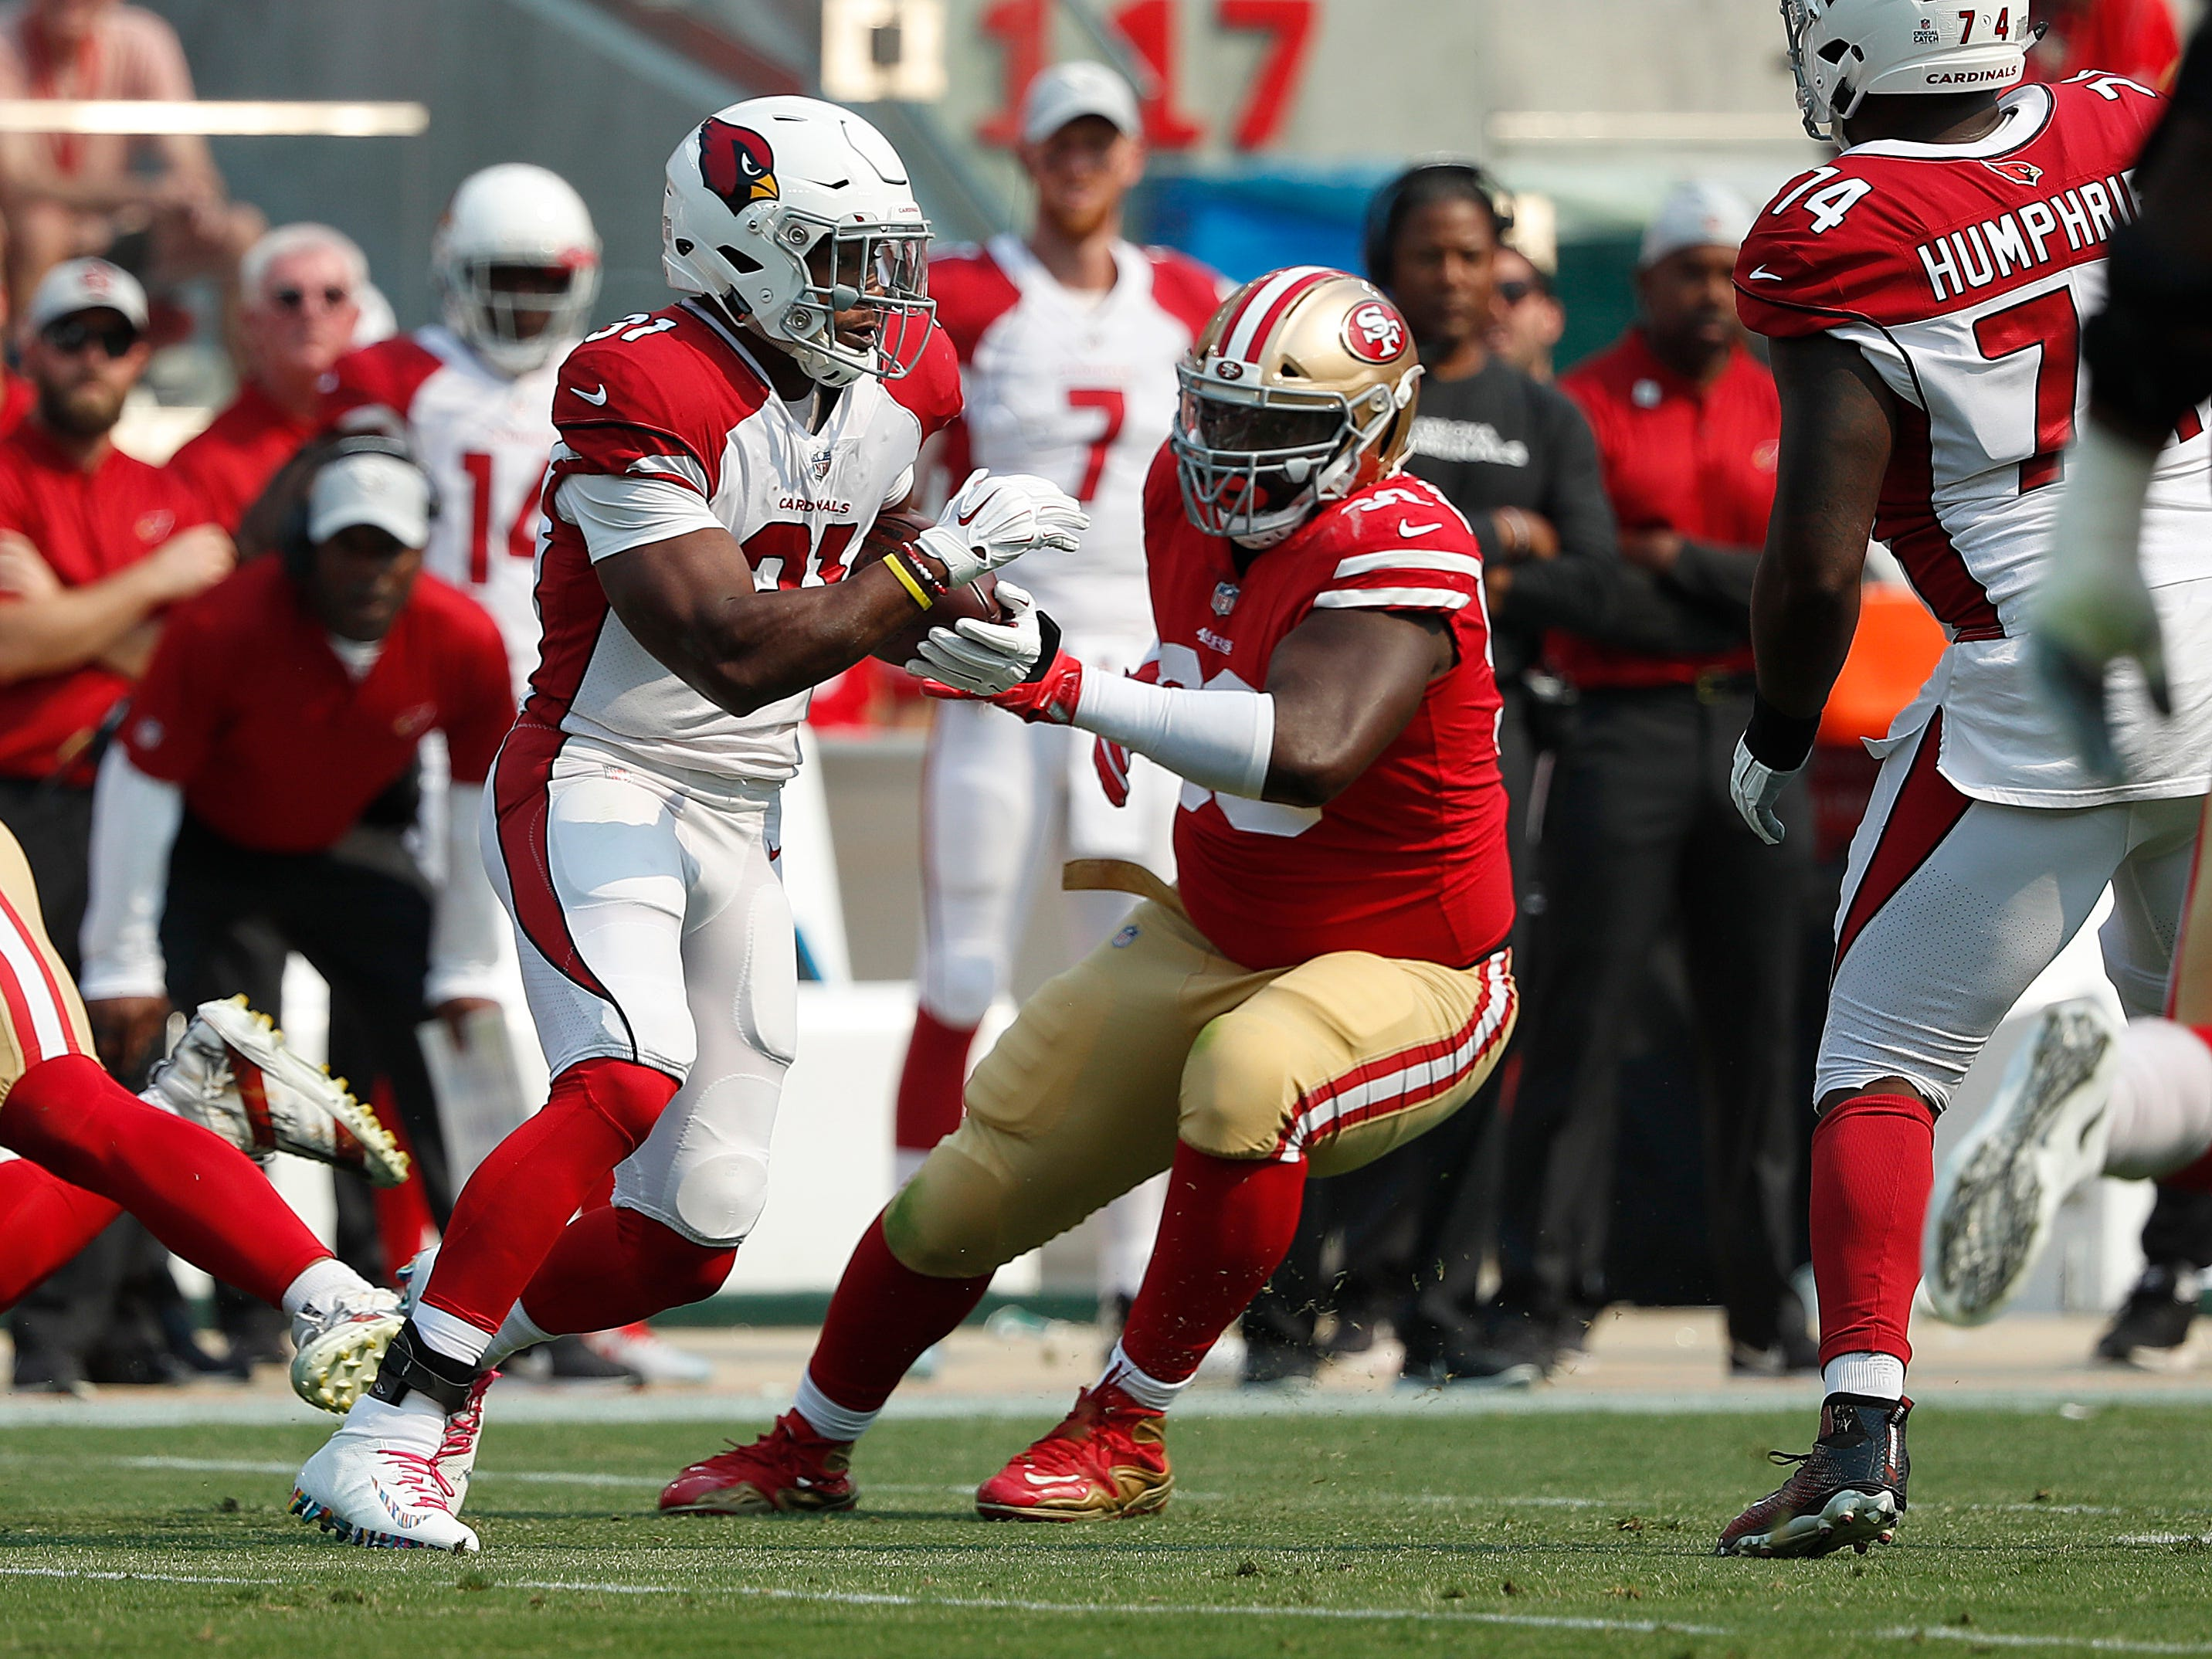 Arizona Cardinals running back David Johnson (31) runs against the San Francisco 49ers during the first half of an NFL football game in Santa Clara, Calif., Sunday, Oct. 7, 2018.